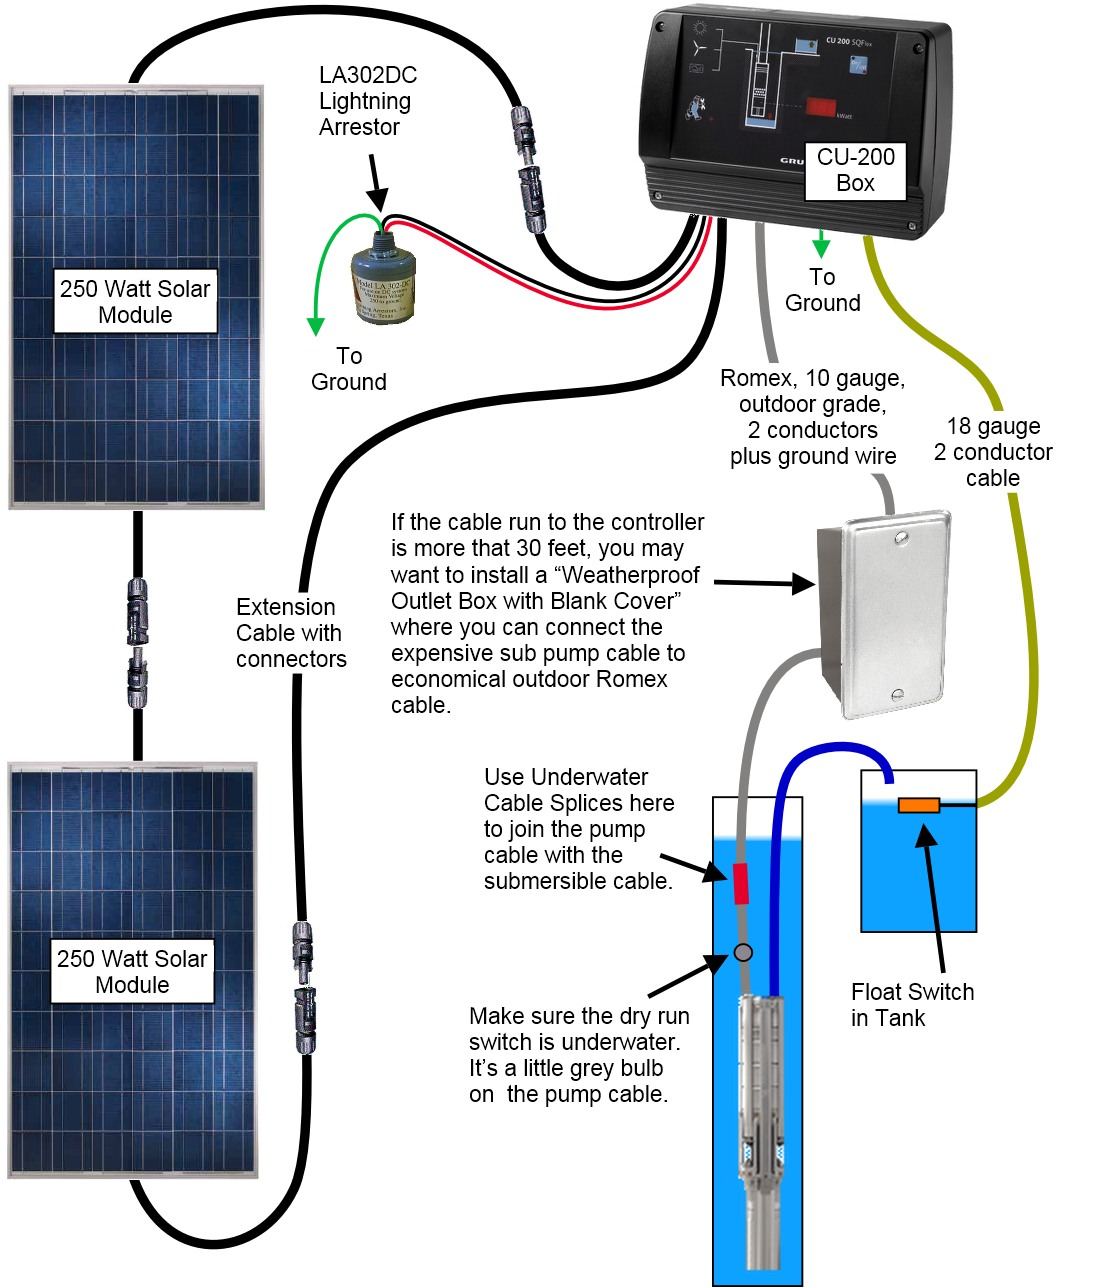 grundfos sqflex installation diagram?t\=1422423383 shurflo pump wiring diagram deere rate controller diagram \u2022 free Liberty Pump Wiring Diagram at gsmx.co